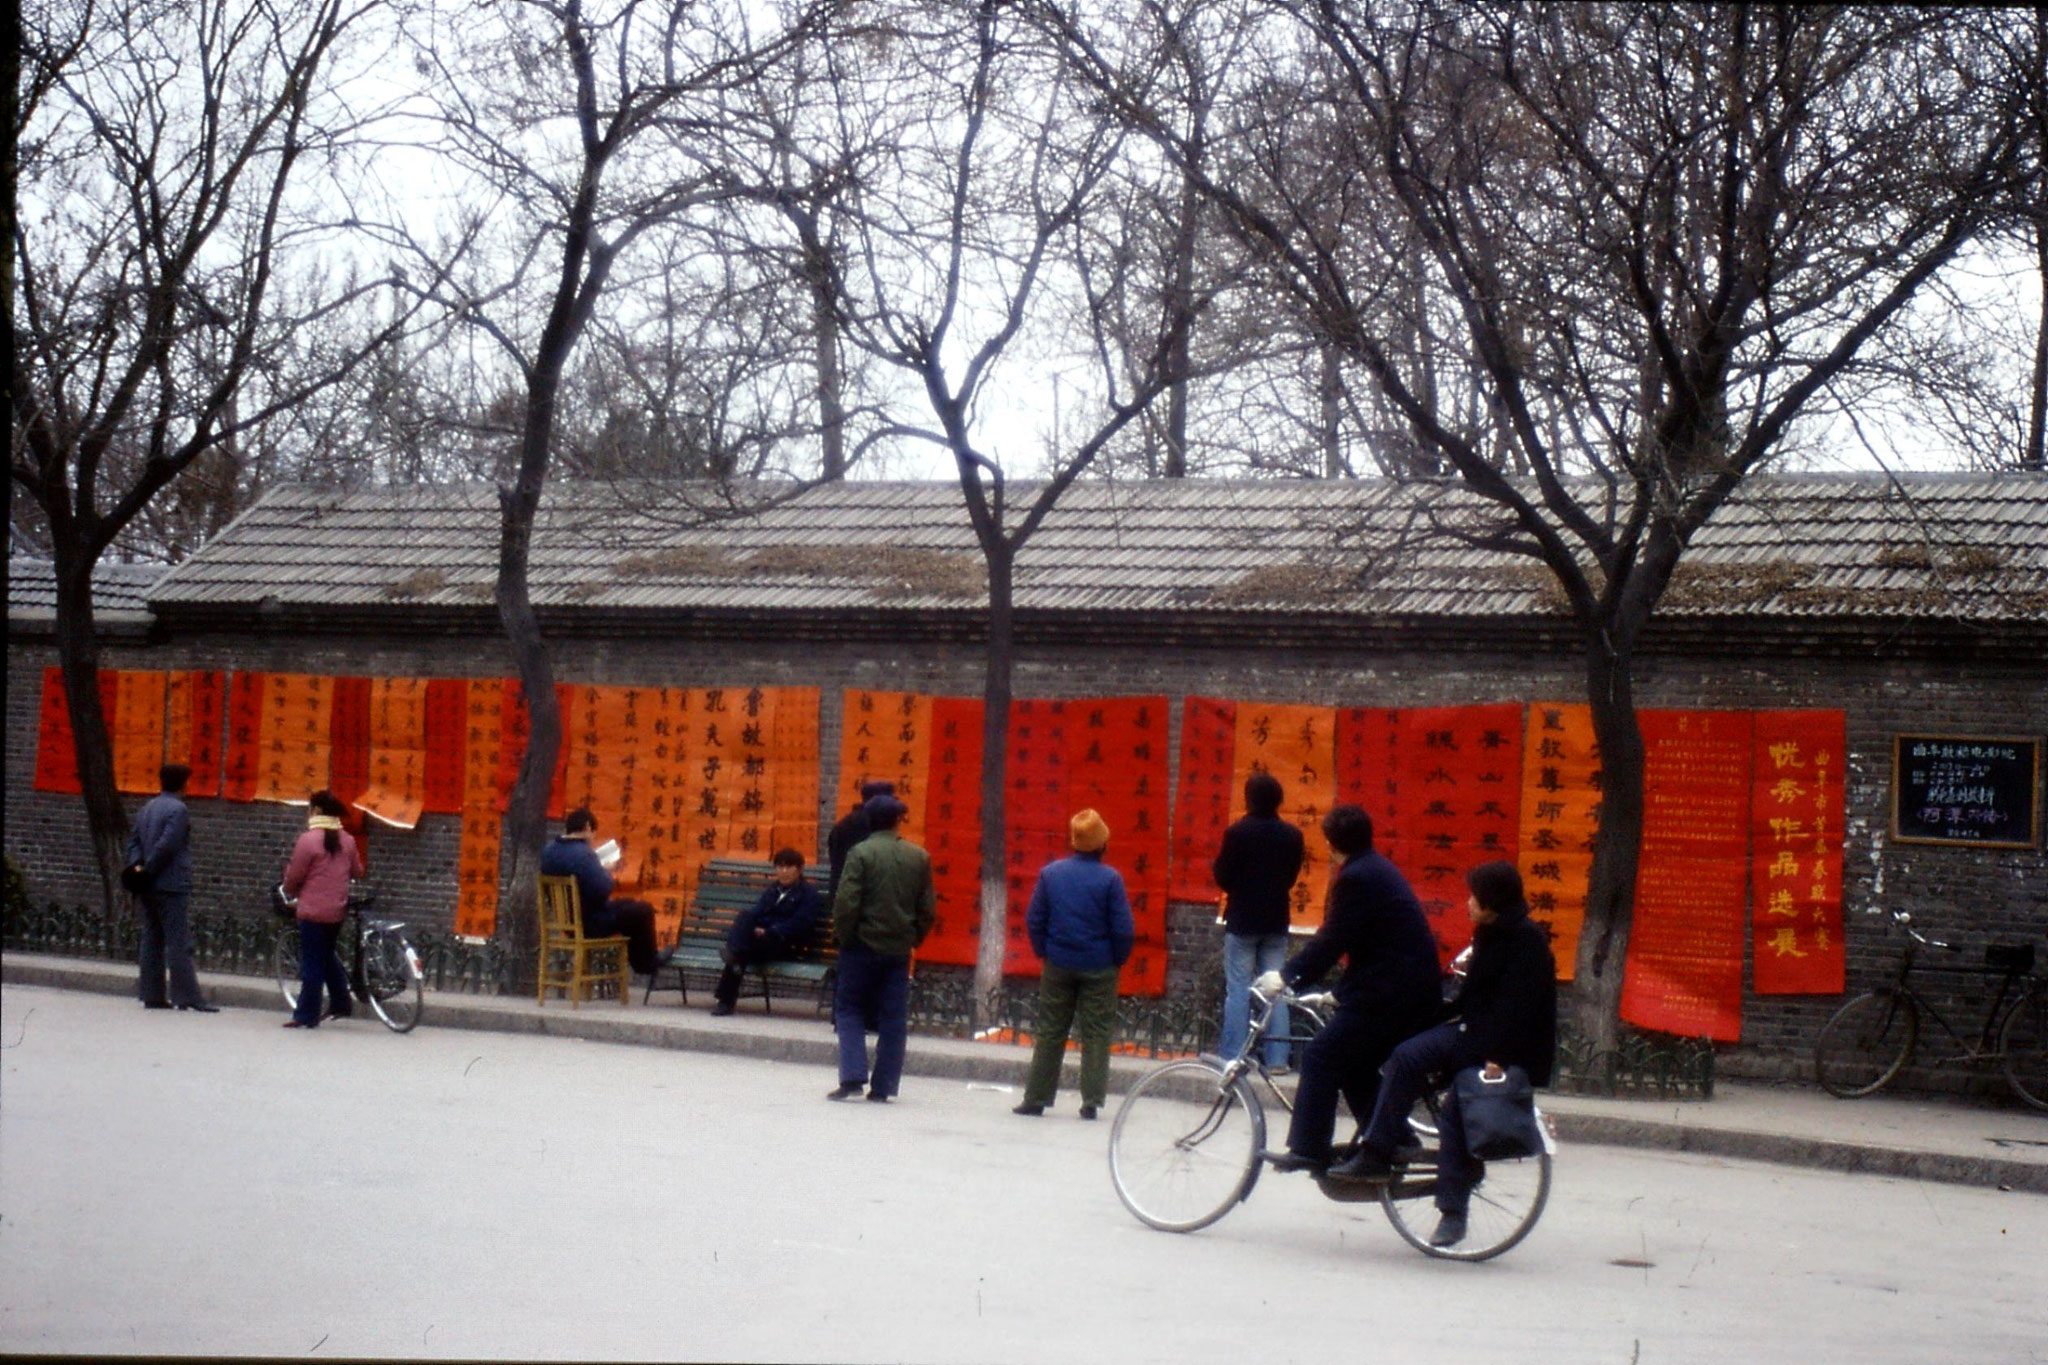 20/2/1989: 29: Qufu posters outside Confucius Museum